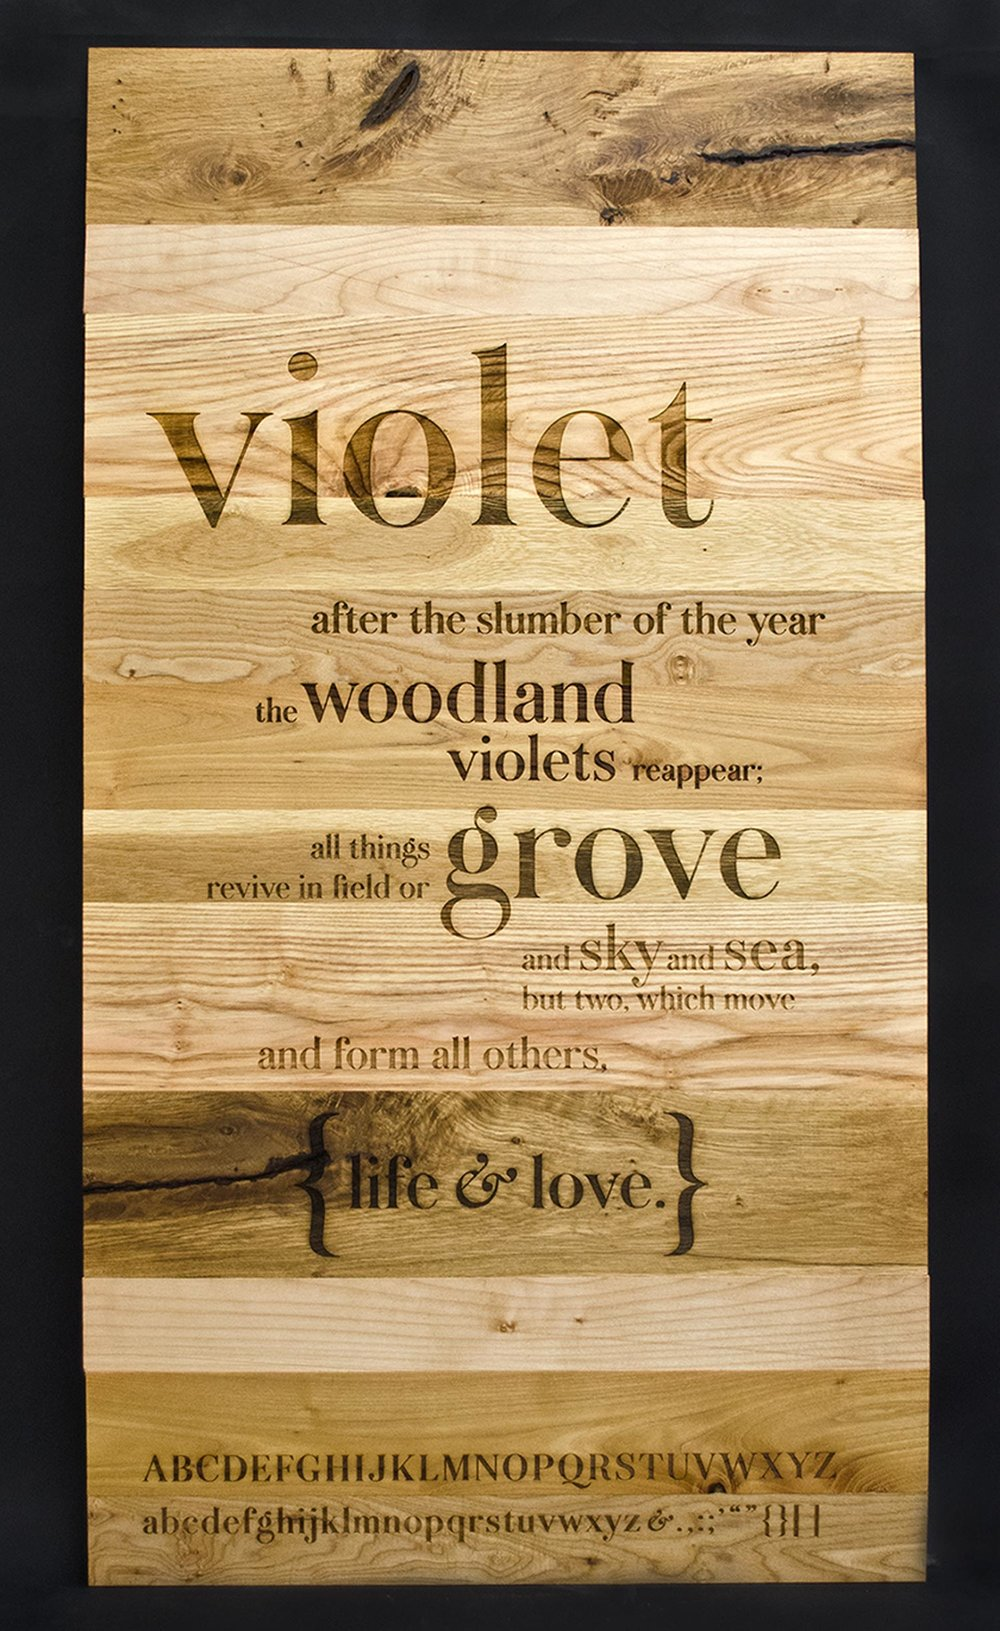 Violet_1.jpg